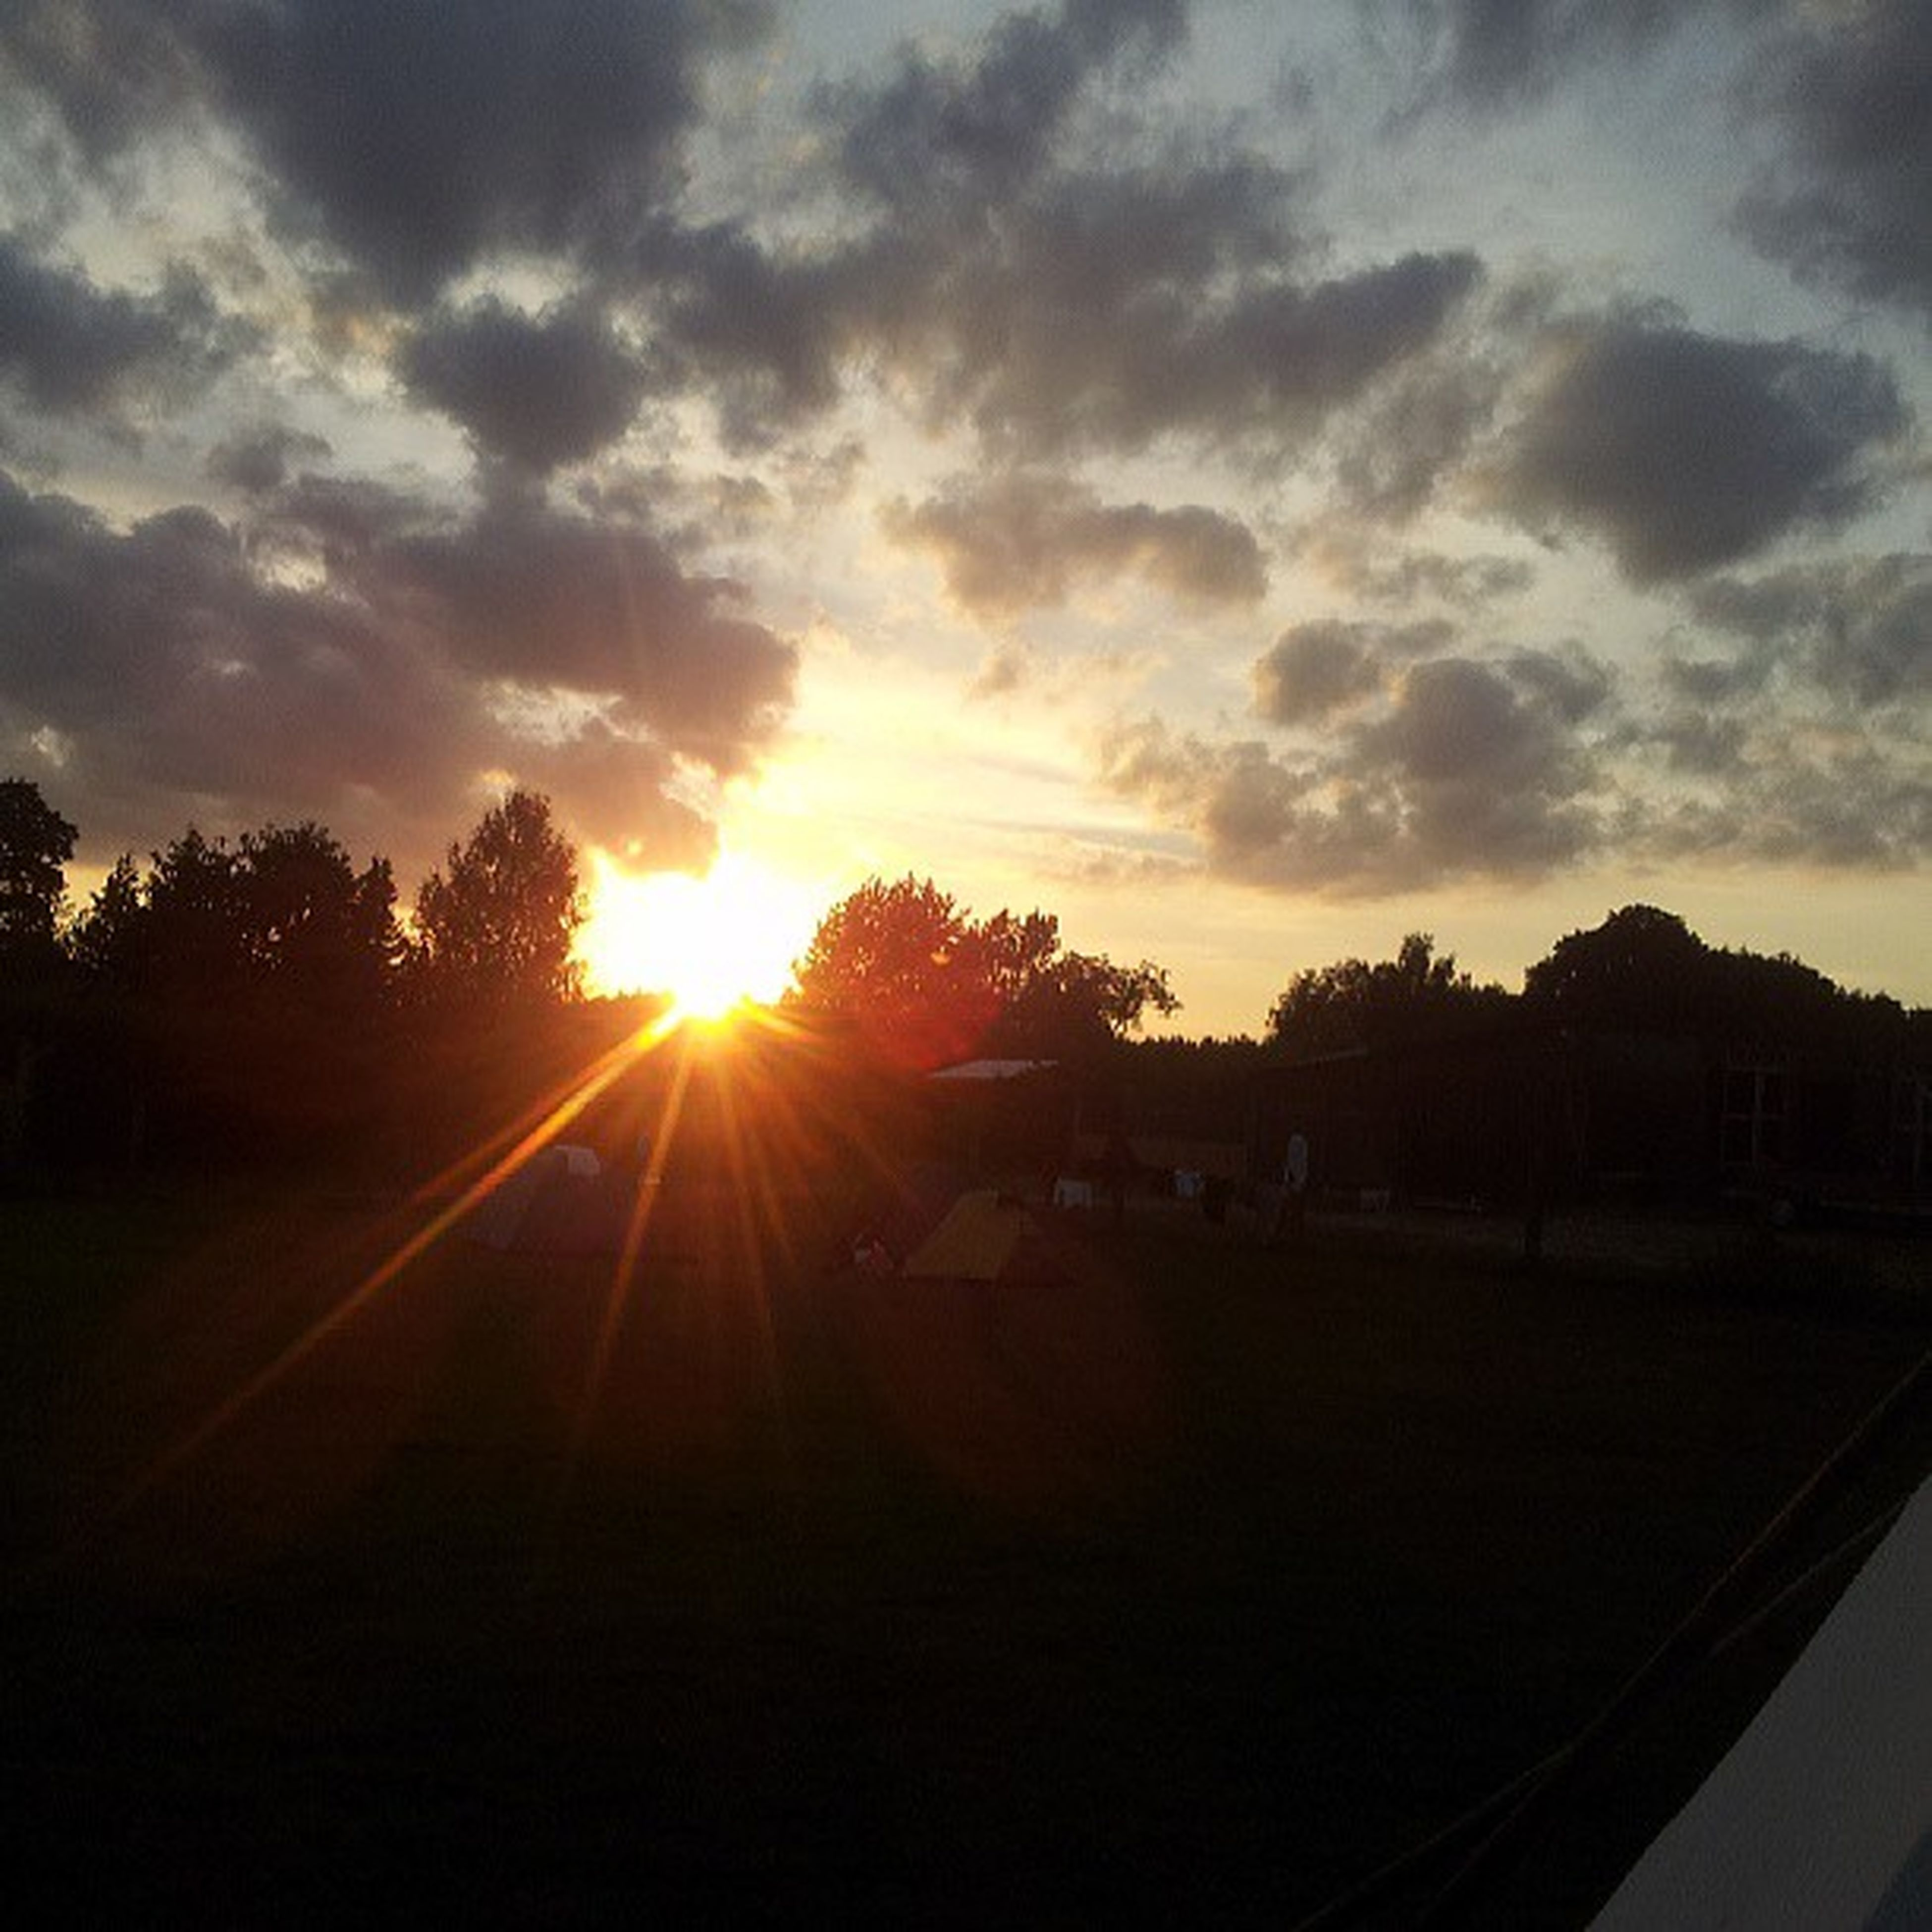 sunset, sun, silhouette, sky, tree, sunbeam, sunlight, tranquil scene, tranquility, scenics, landscape, beauty in nature, cloud - sky, lens flare, orange color, nature, idyllic, field, cloud, outdoors